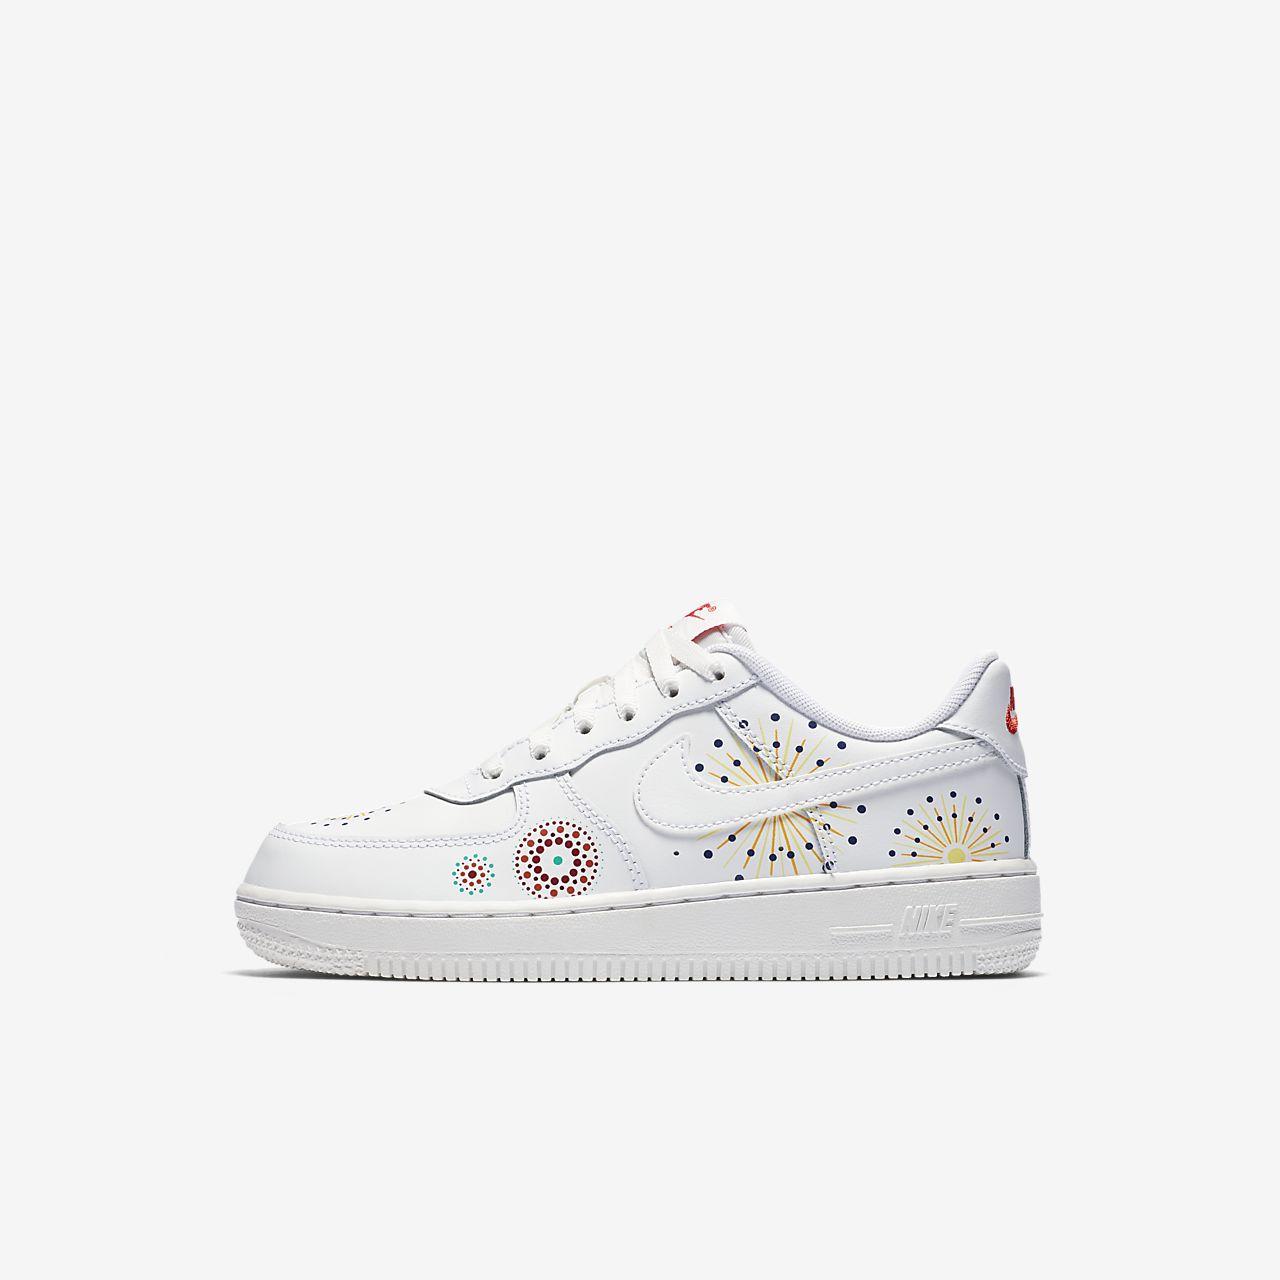 ... Nike Air Force 1 Pinnacle QS Younger Kids' Shoe